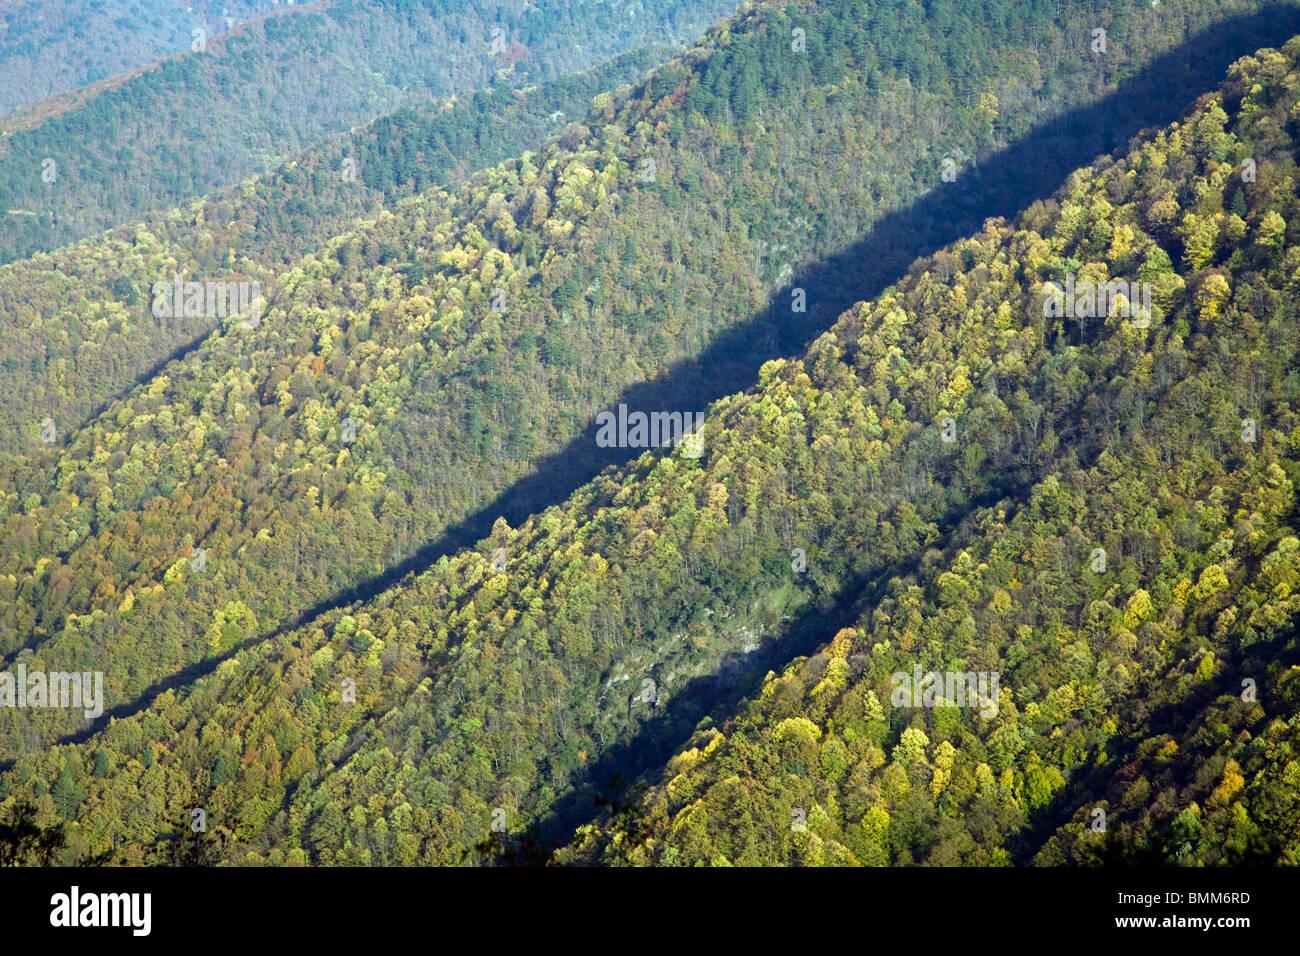 Farben des Herbstes in Filyos Wald, Zonguldak, Türkei Stockfoto ...